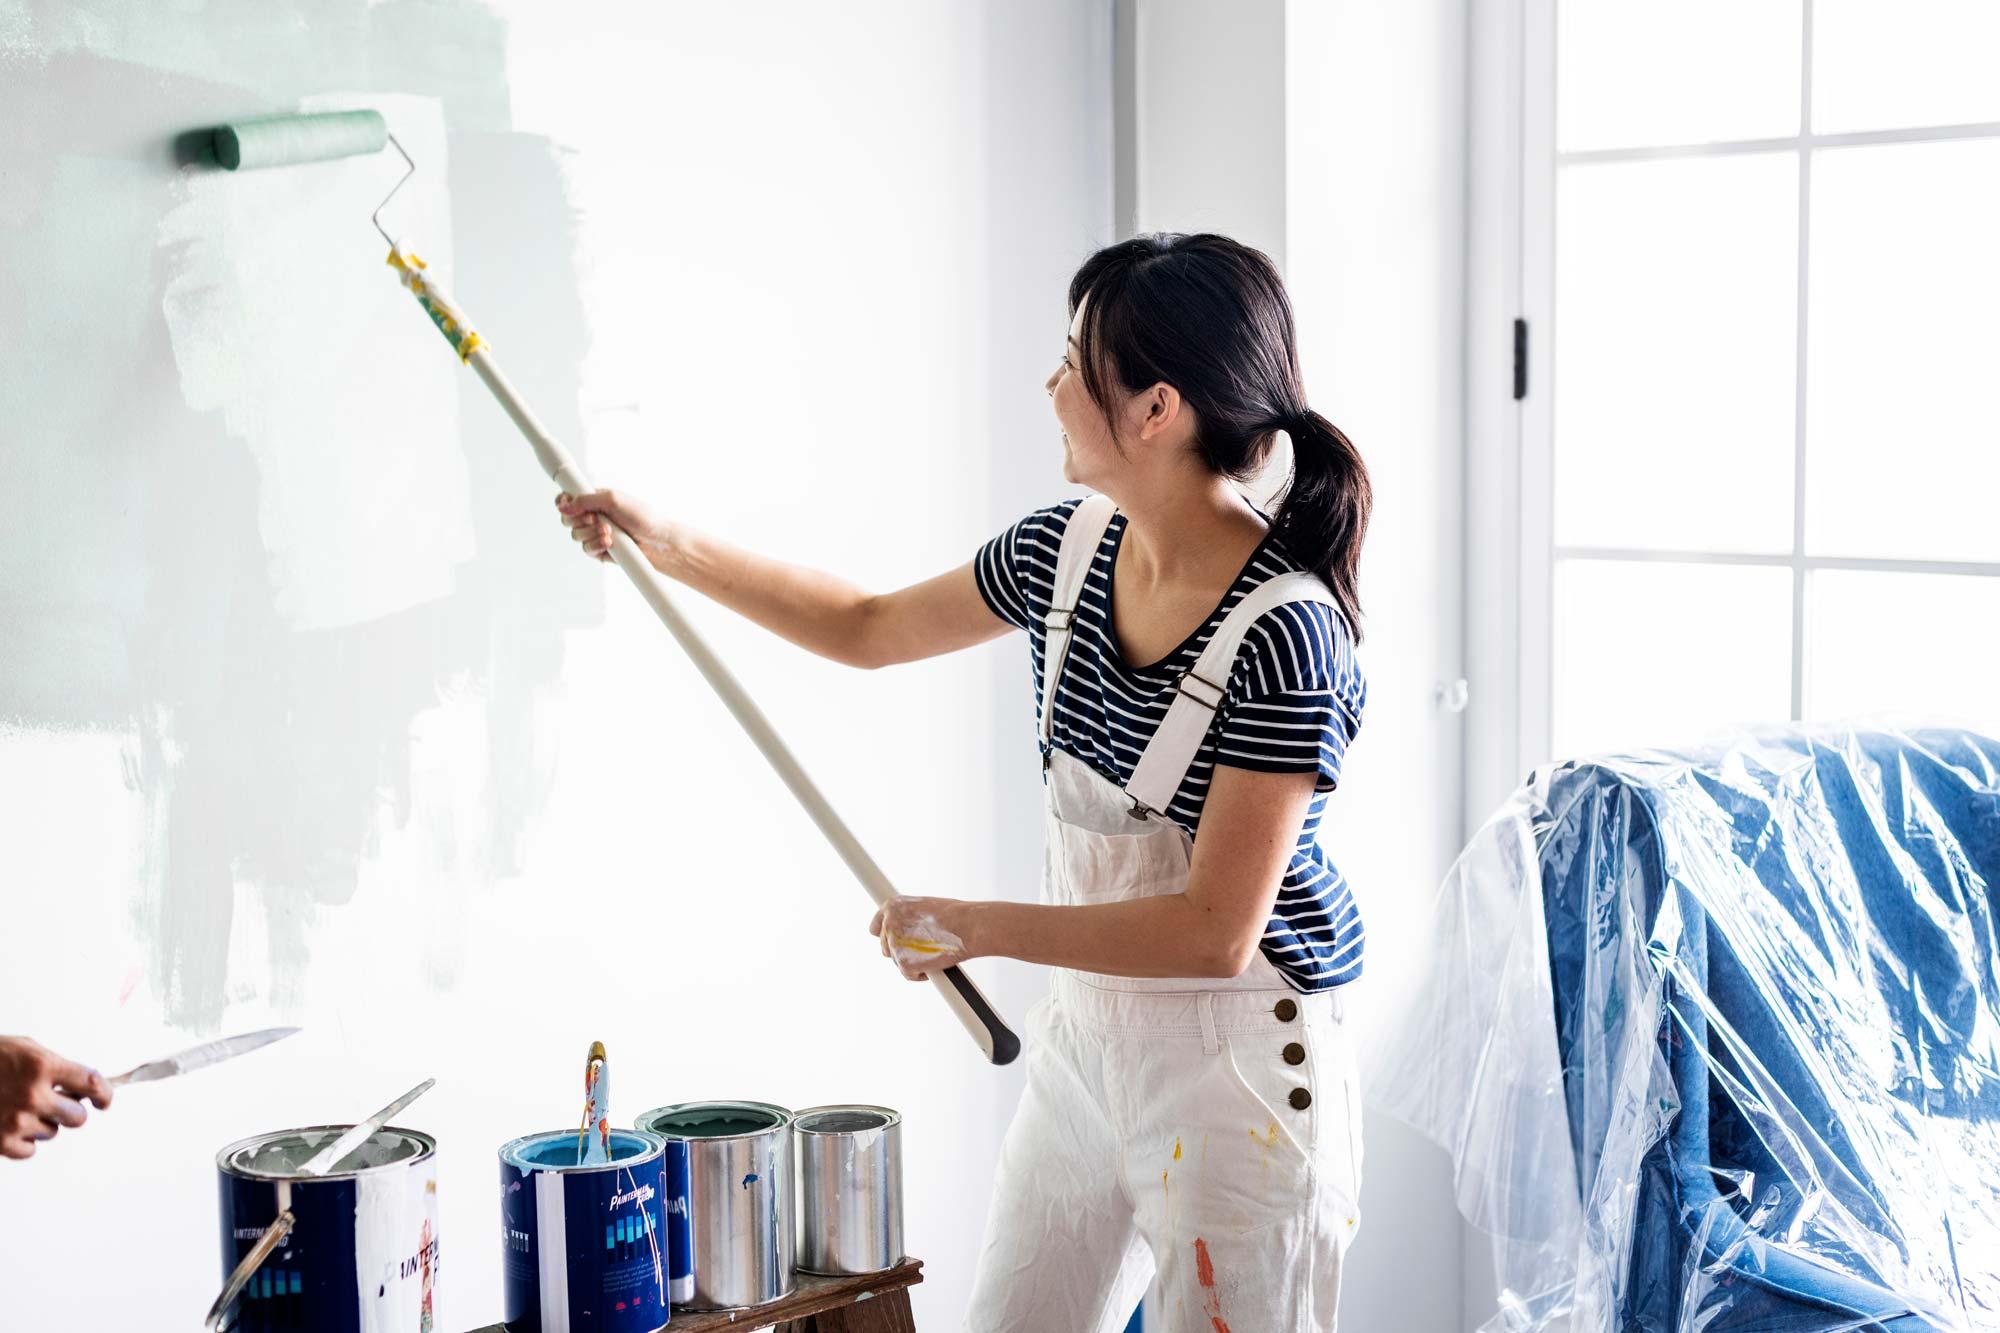 woman painting wall